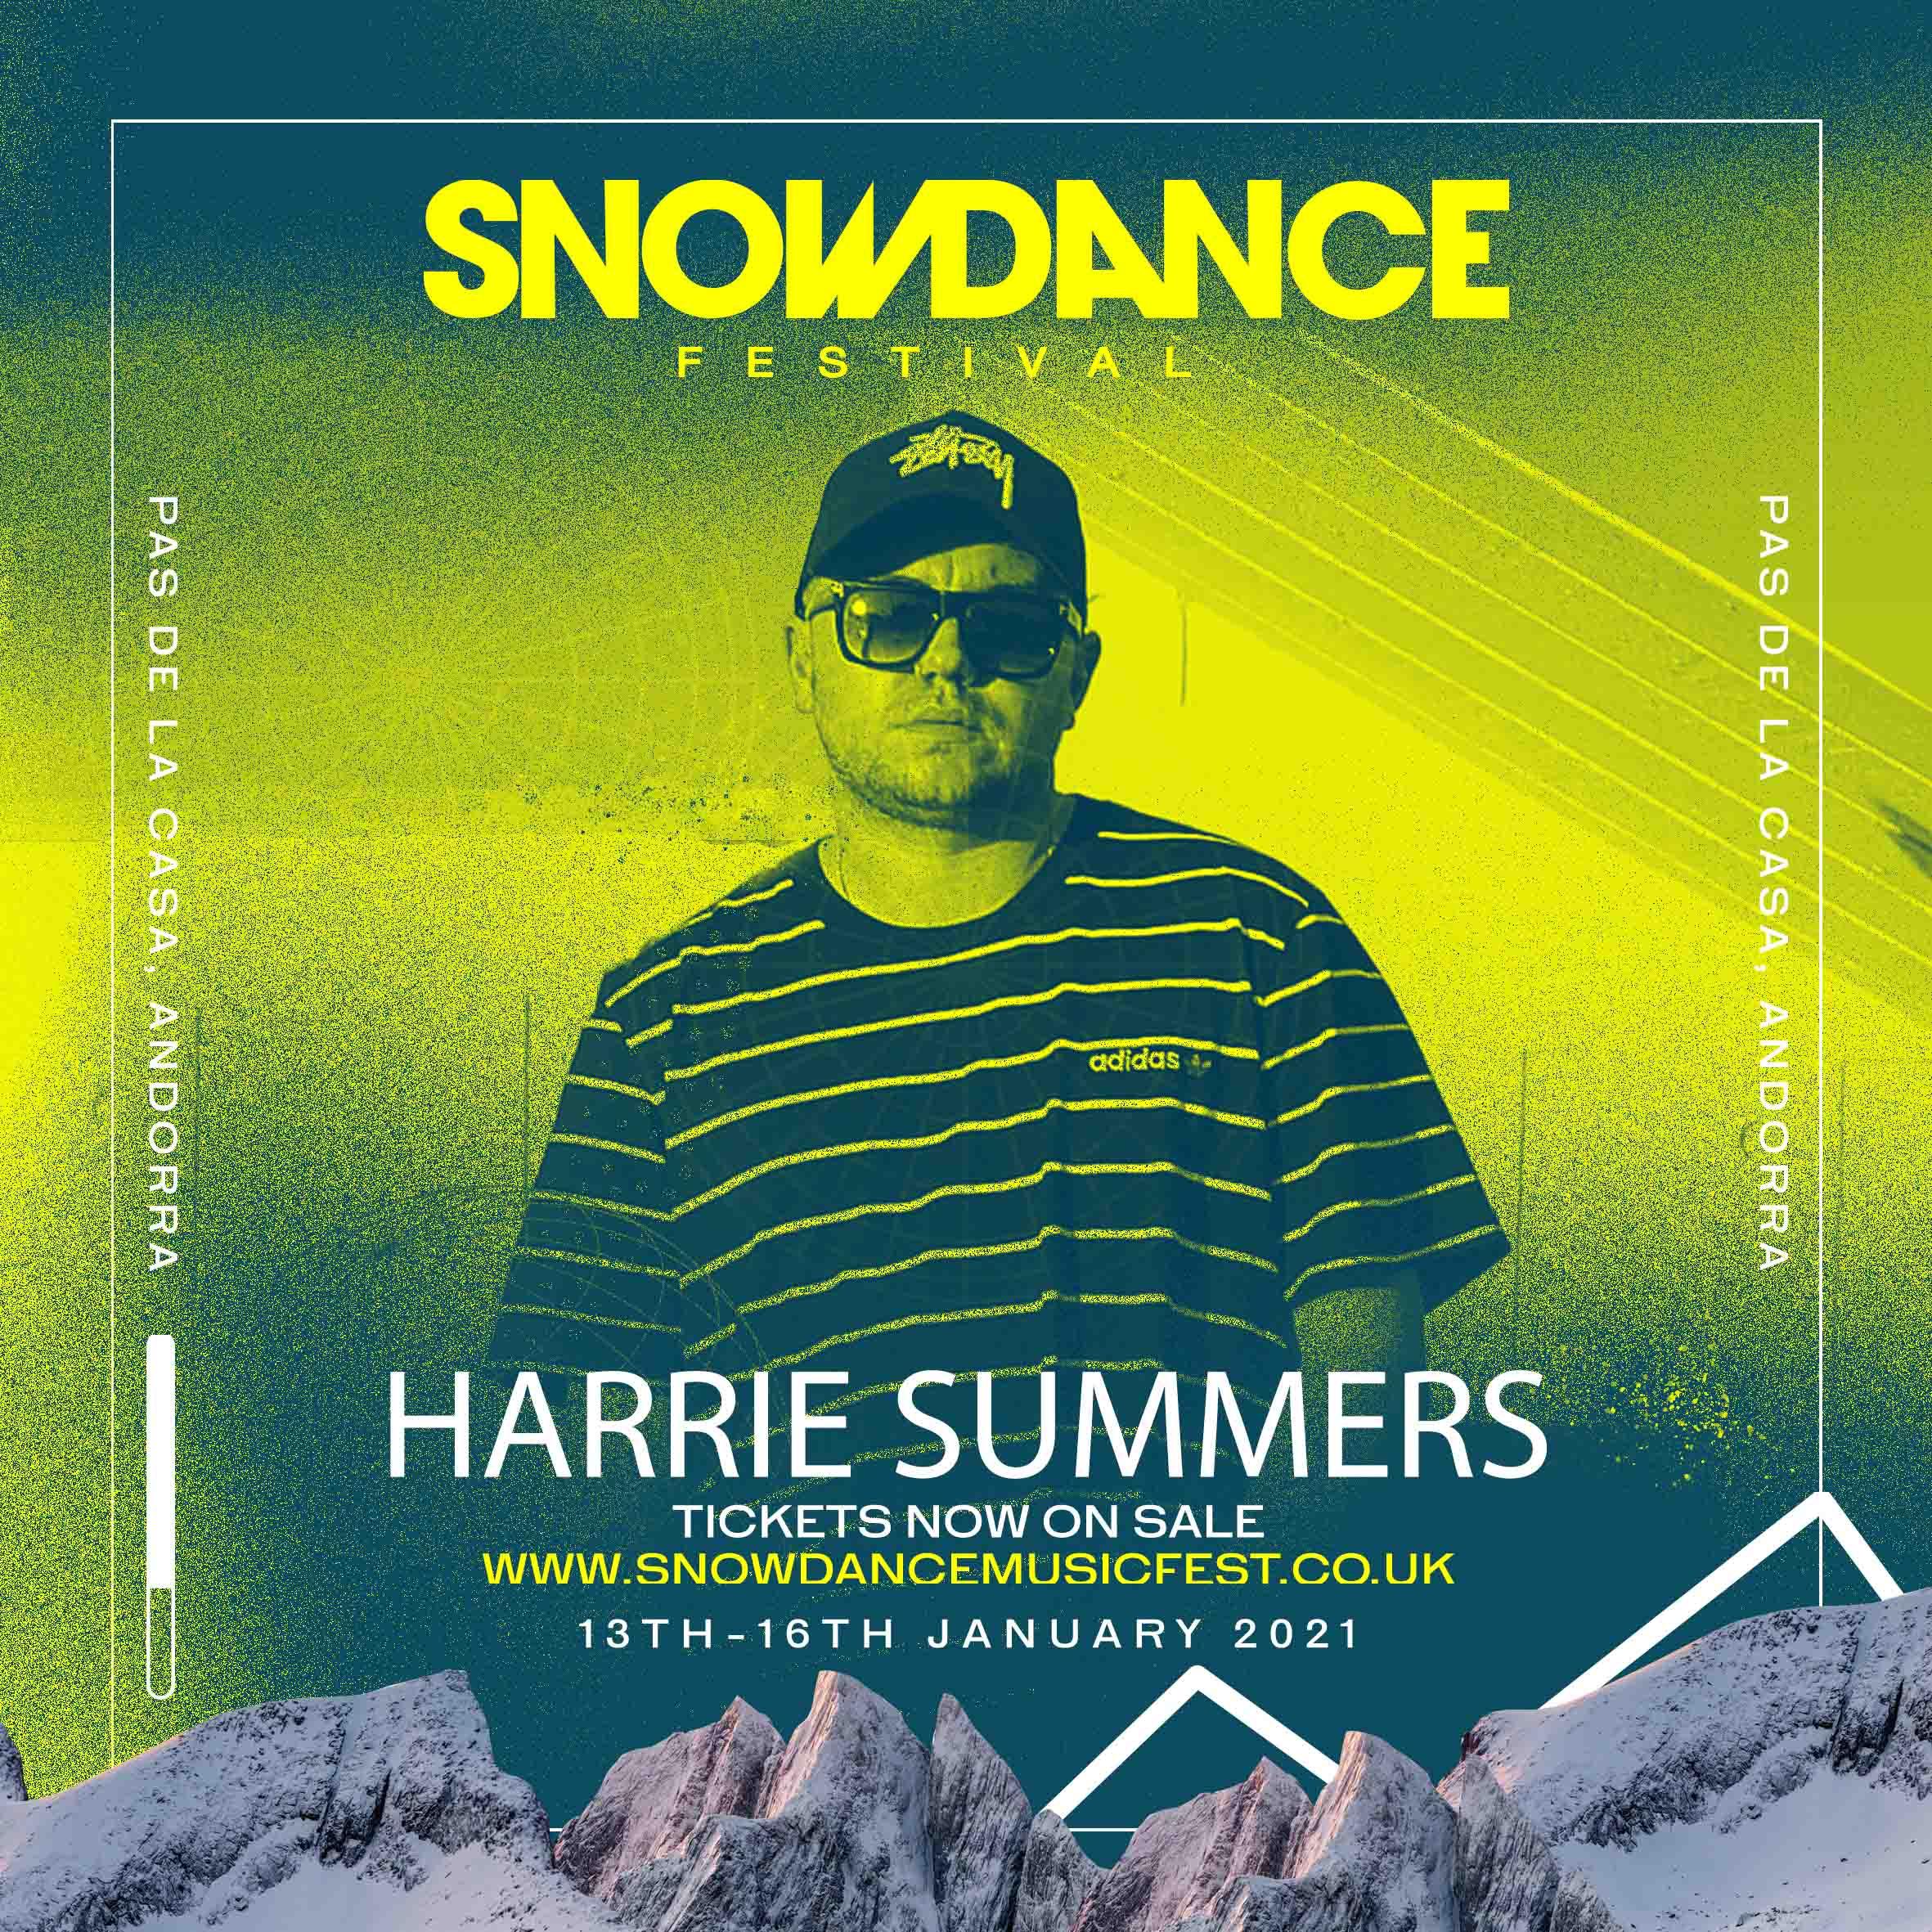 SnowDance festival harrie summers